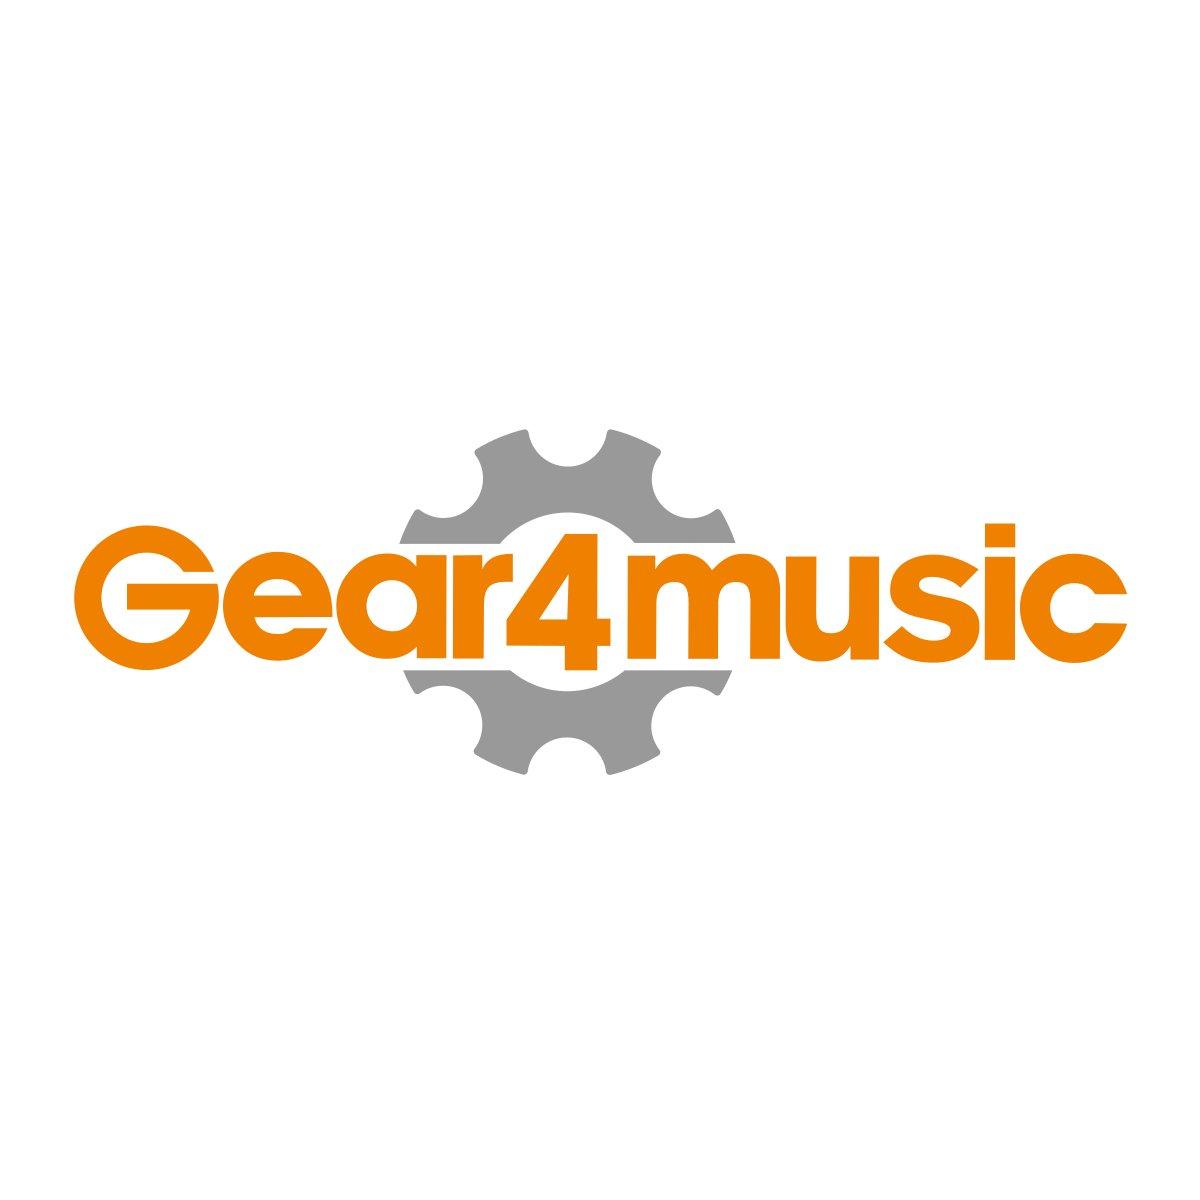 HP-210 Headphones by Gear4music